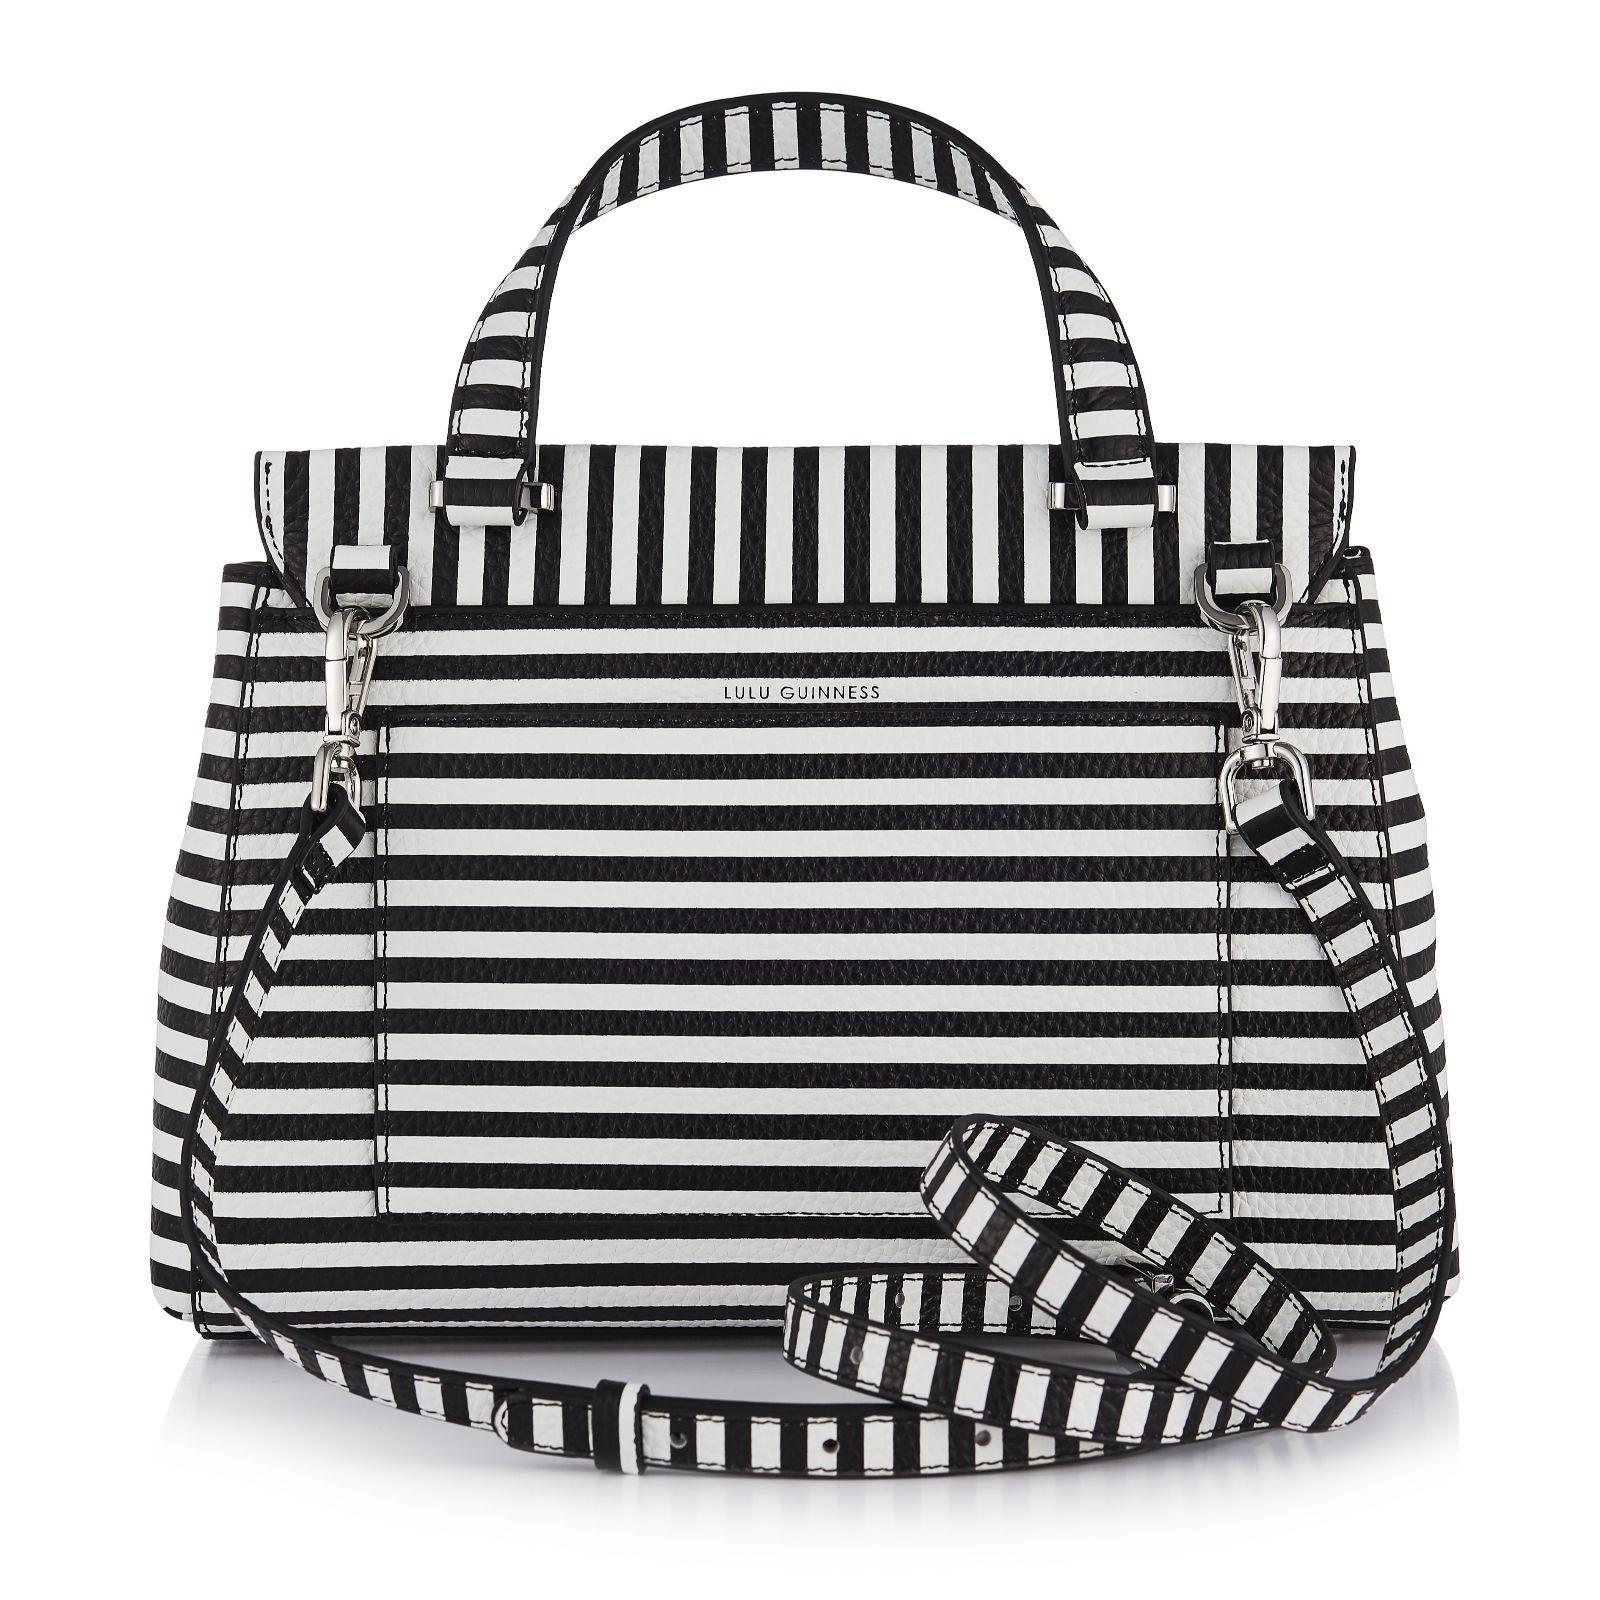 Lulu Guinness Gertie Medium Leather Bag with Crossbody Strap - QVC UK cfa859973f35f